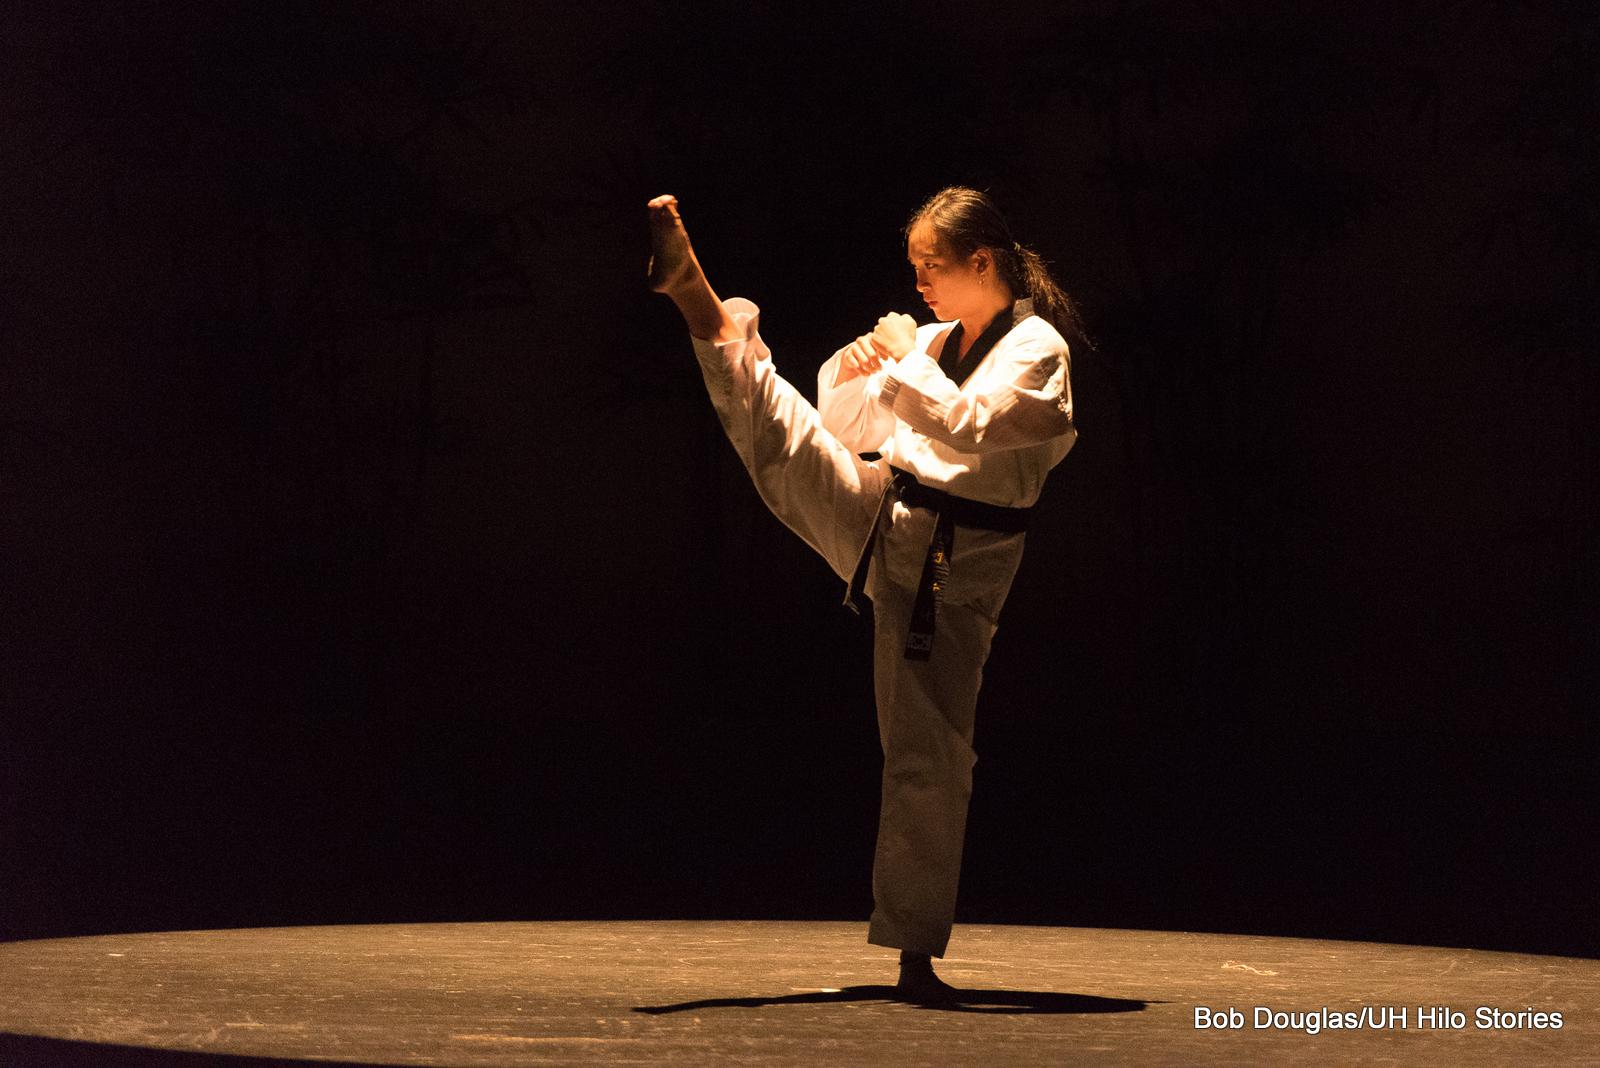 Woman in white kicks leg high in martial arts form.